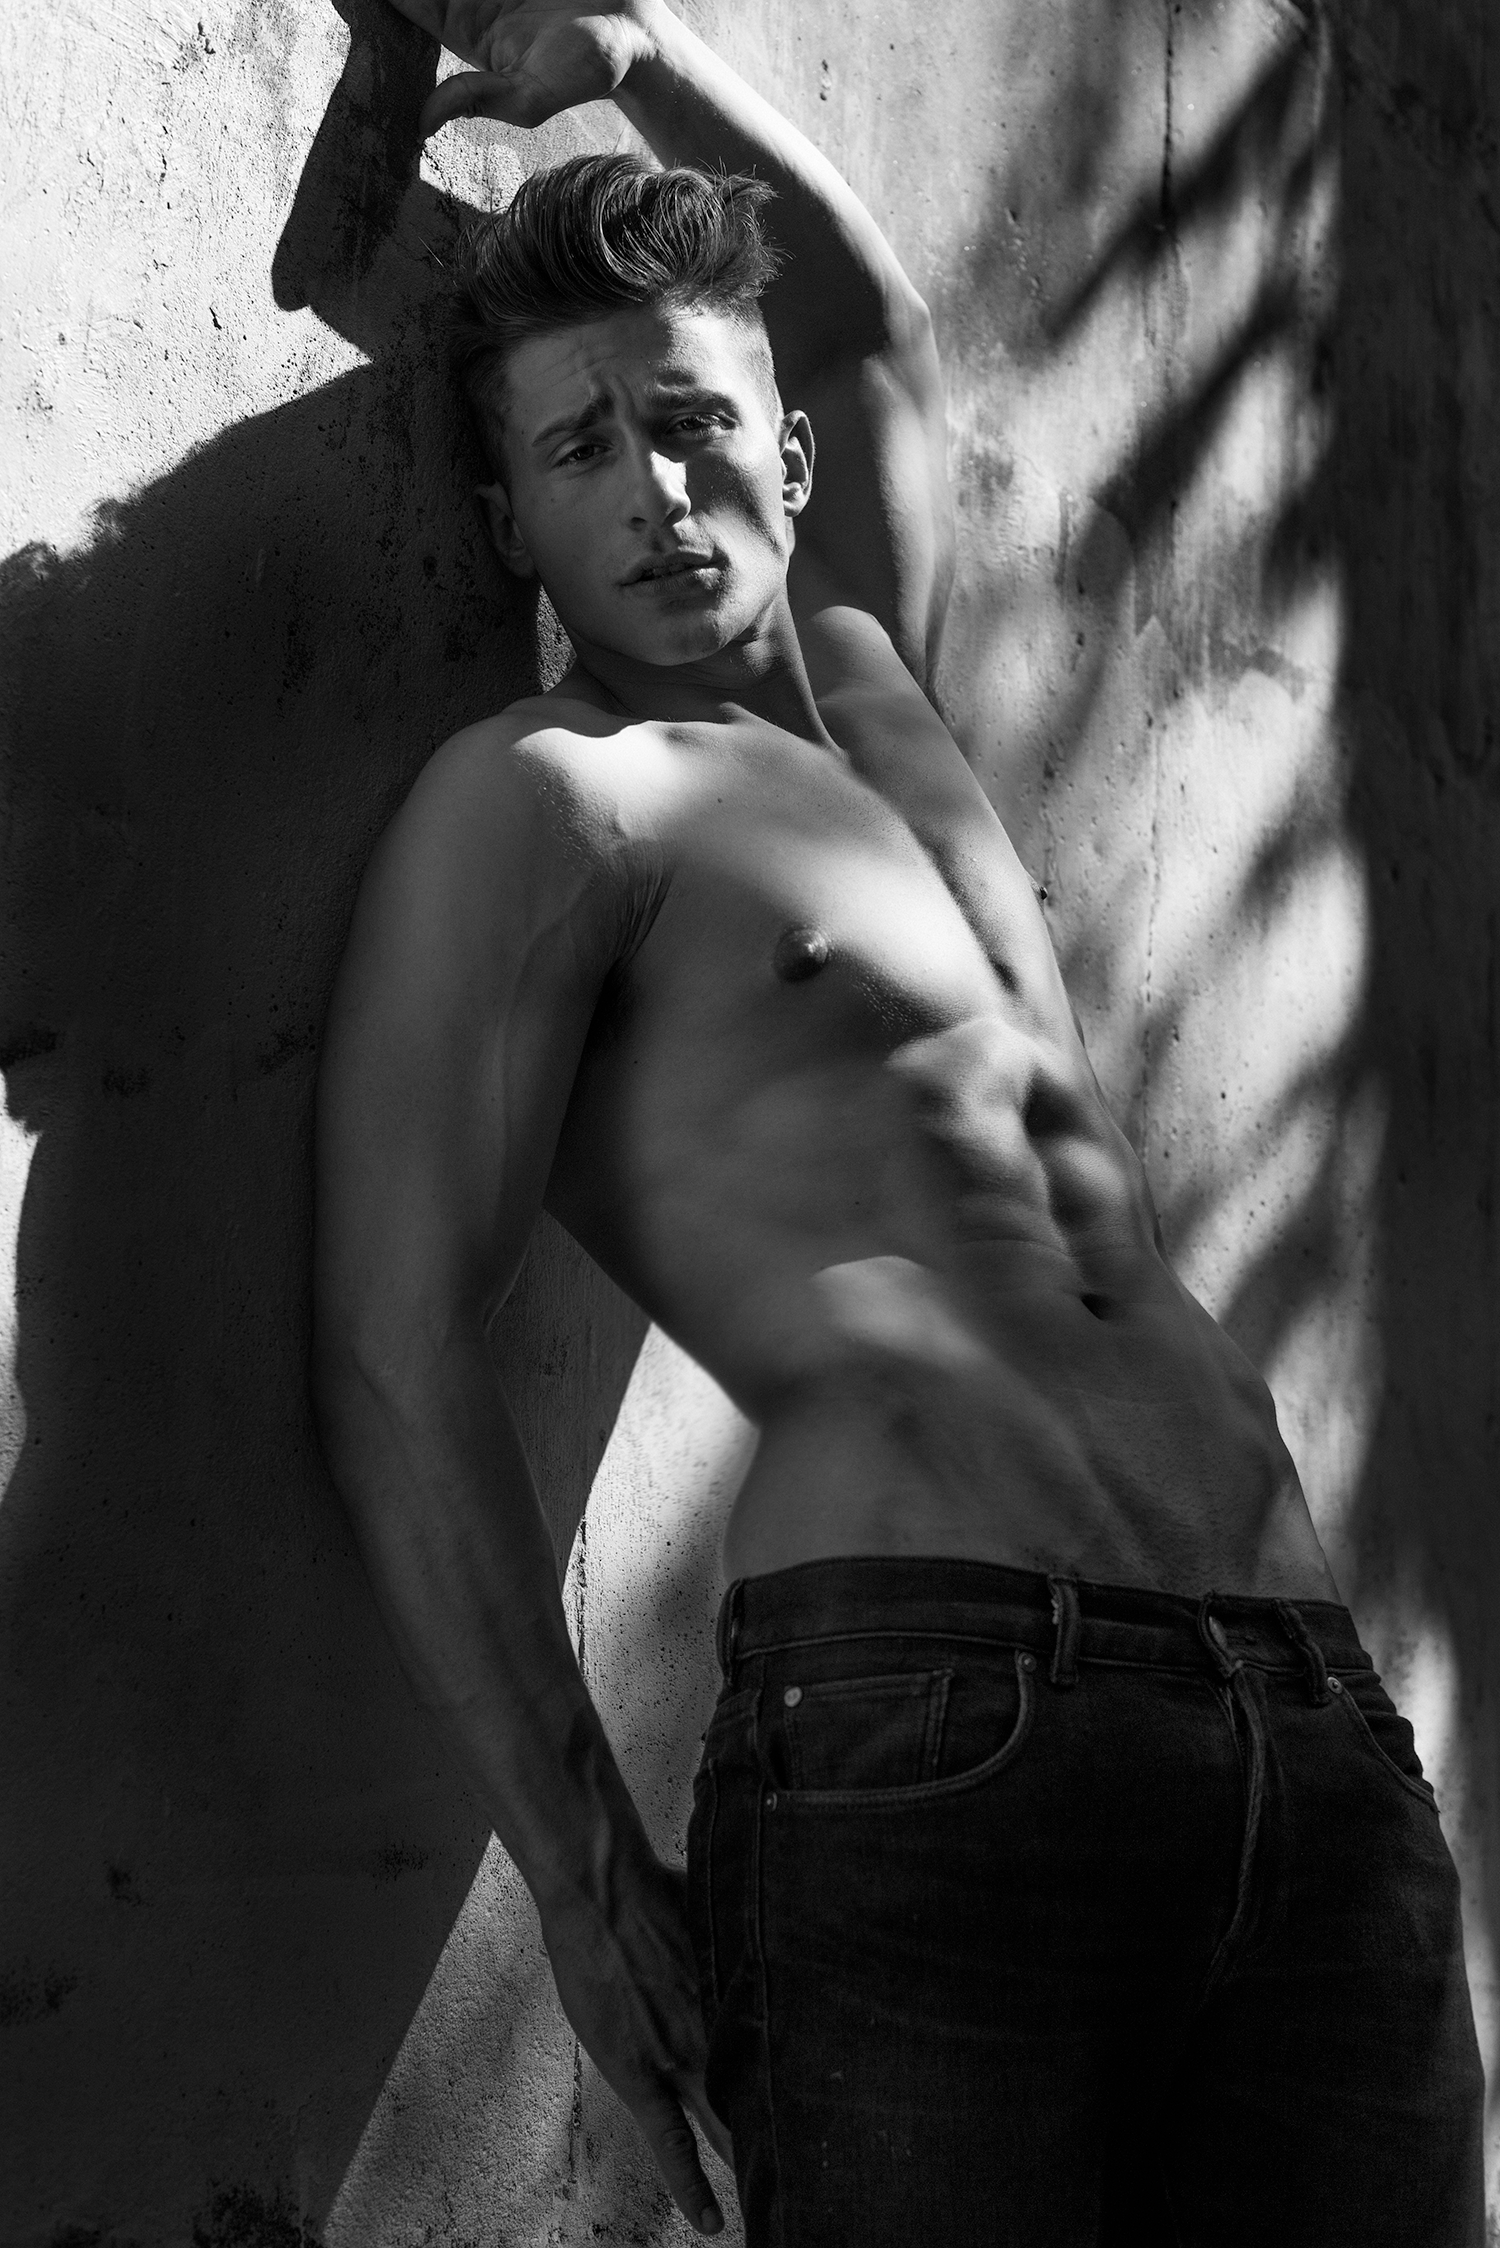 Adon Exclusive: Model Joe Pietrefesa By Frank Marando